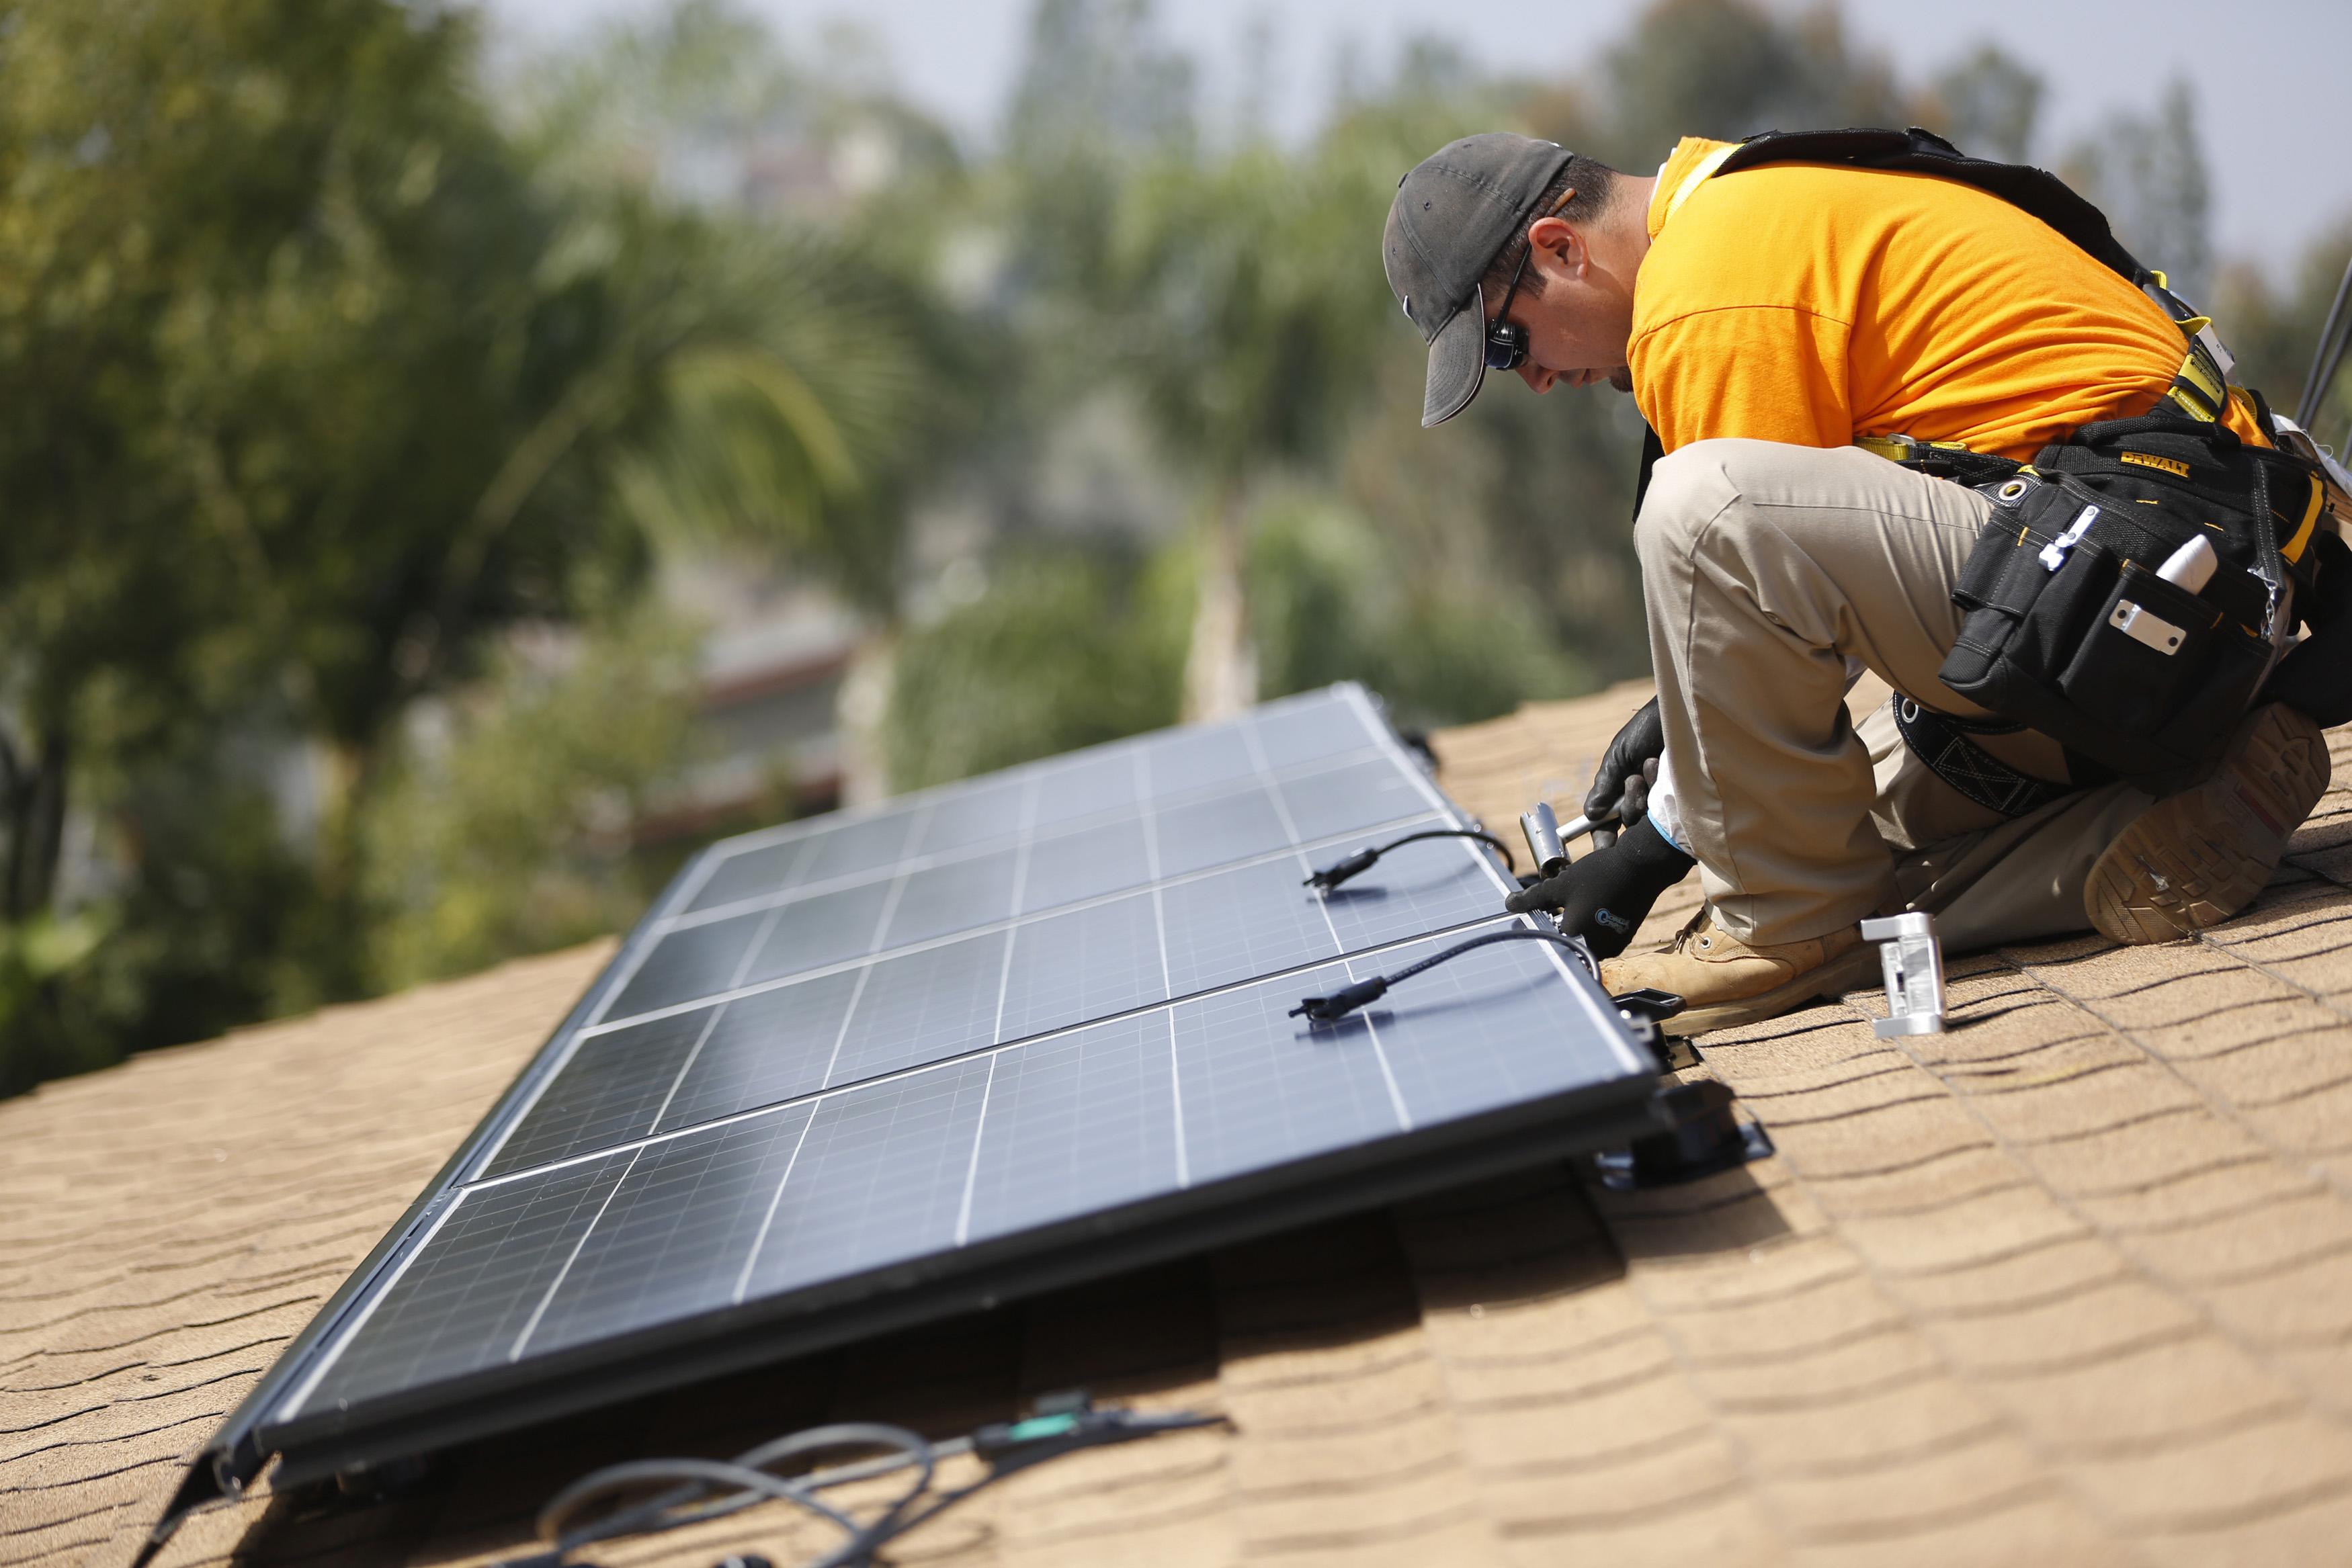 Vivint Solar technician Eduardo Aguilar installs solar panels on the roof of a house in Mission Viejo, California October 25, 2013.